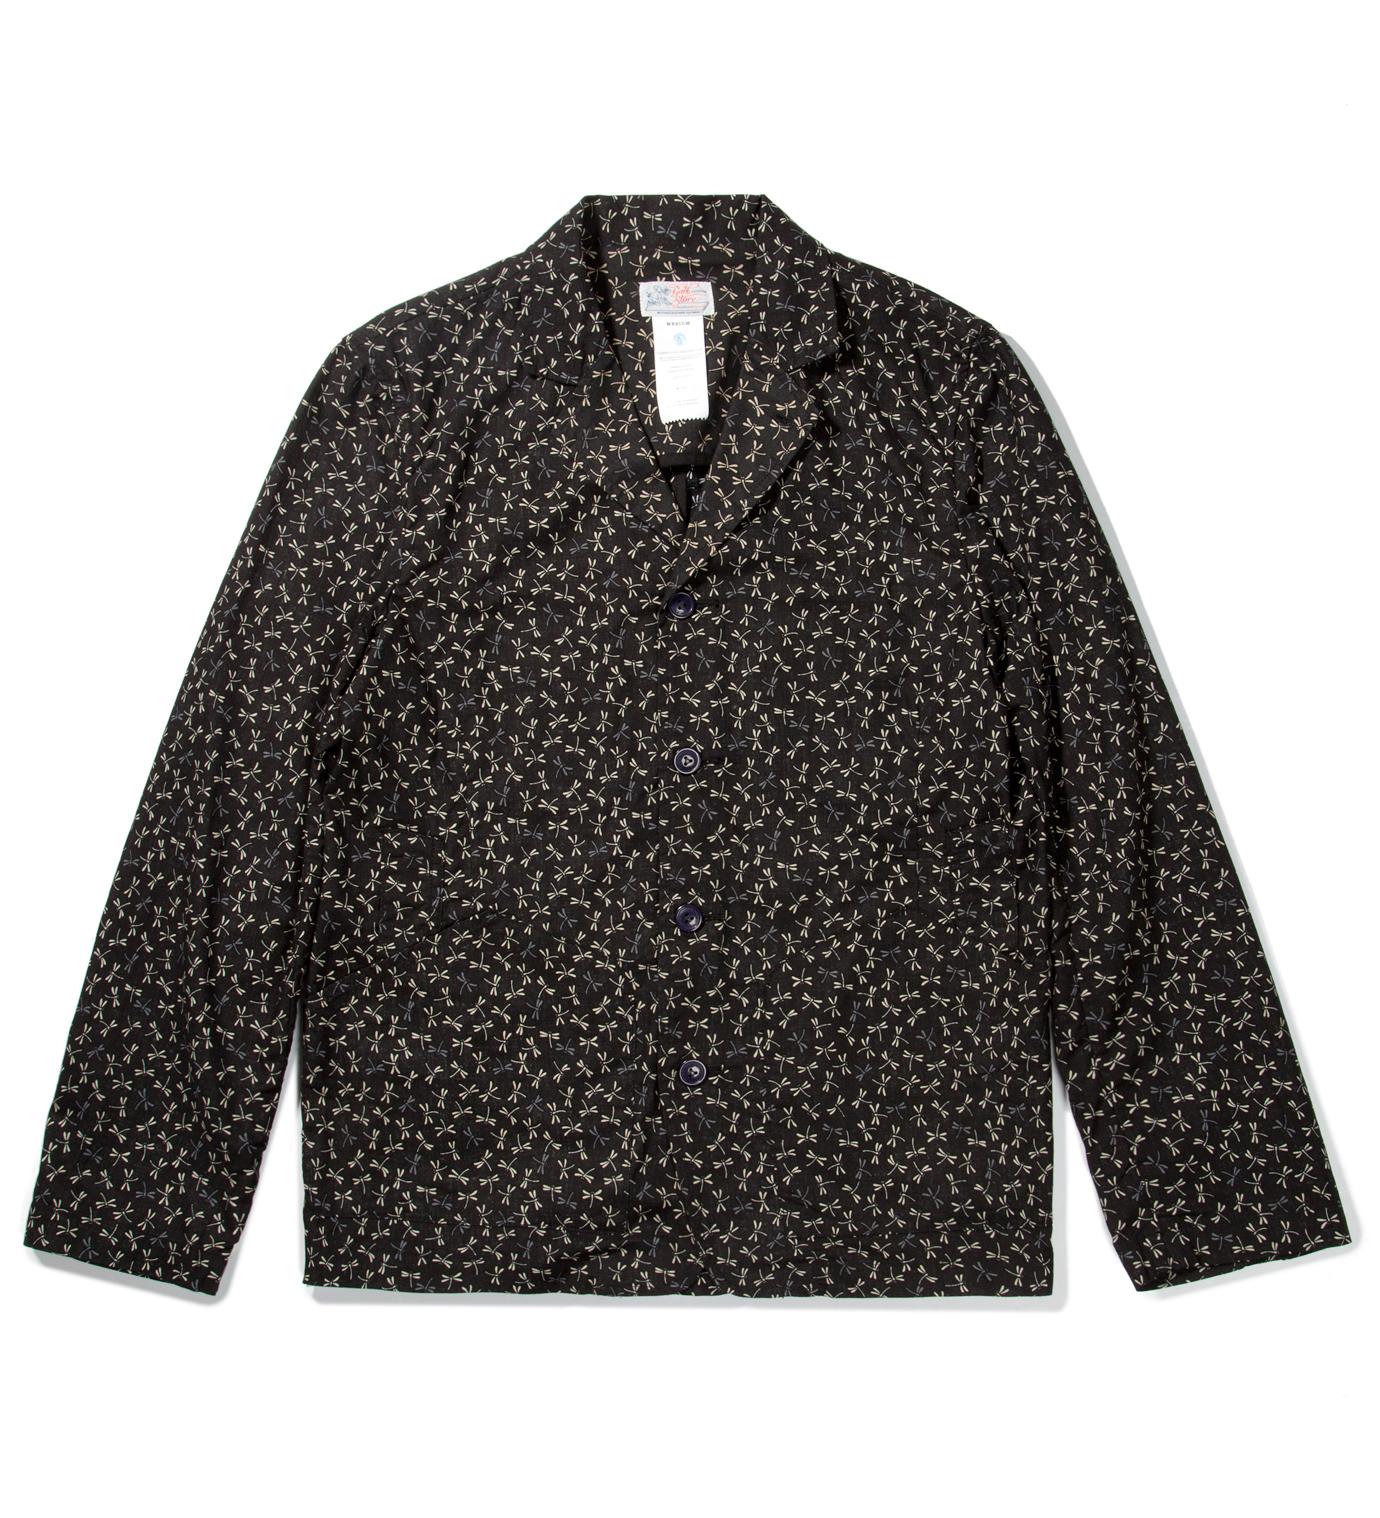 GARBSTORE Black Floral Rydal Sport Jacket